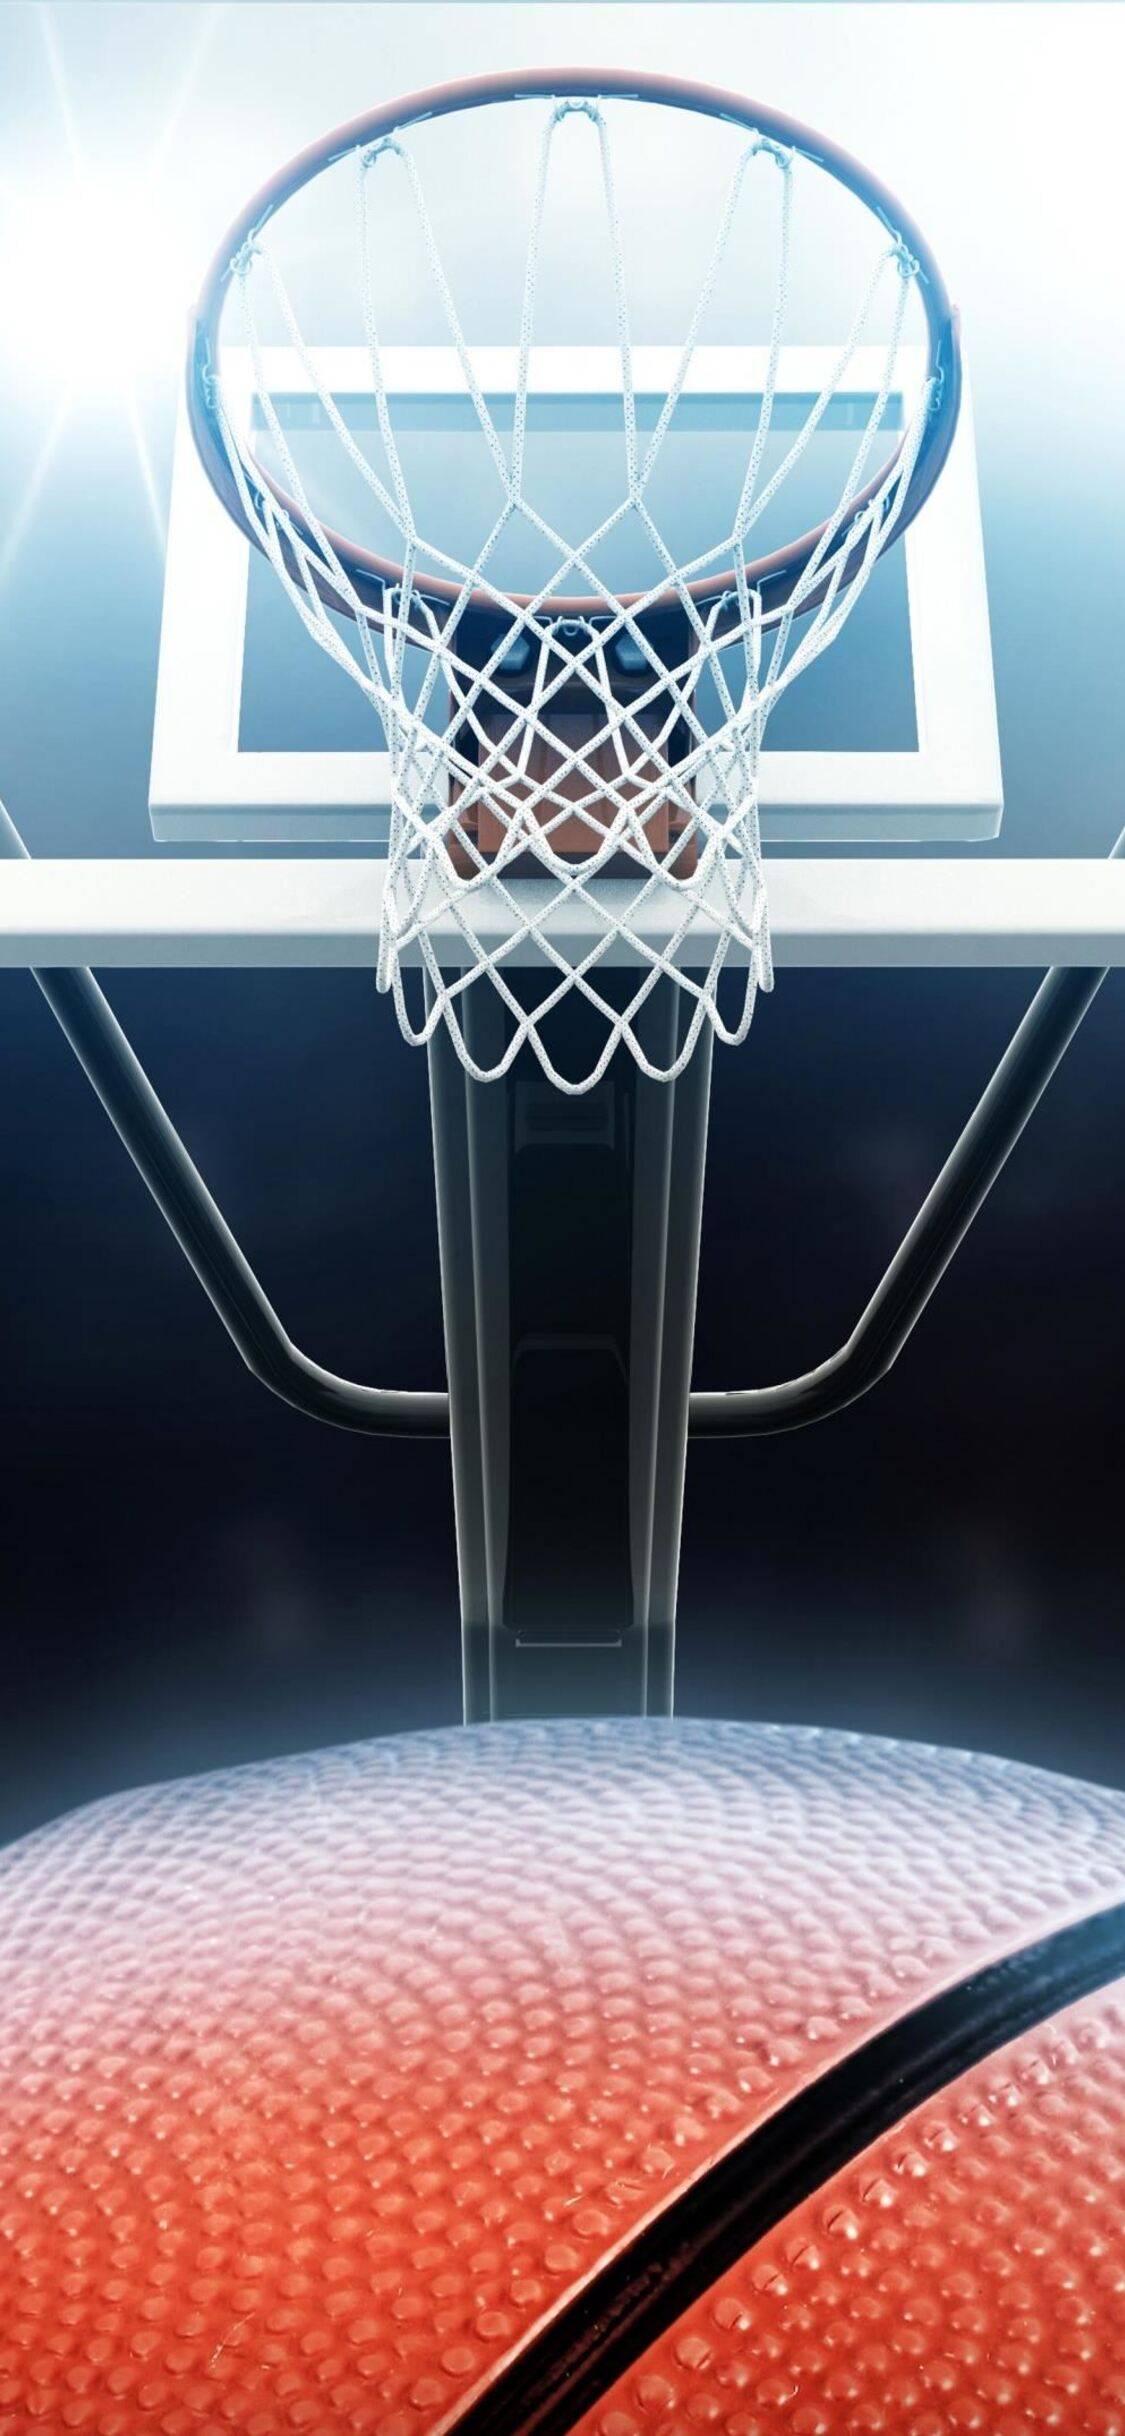 1125x2436 Basketball 4k Iphone Xs Iphone 10 Iphone X Hd 4k